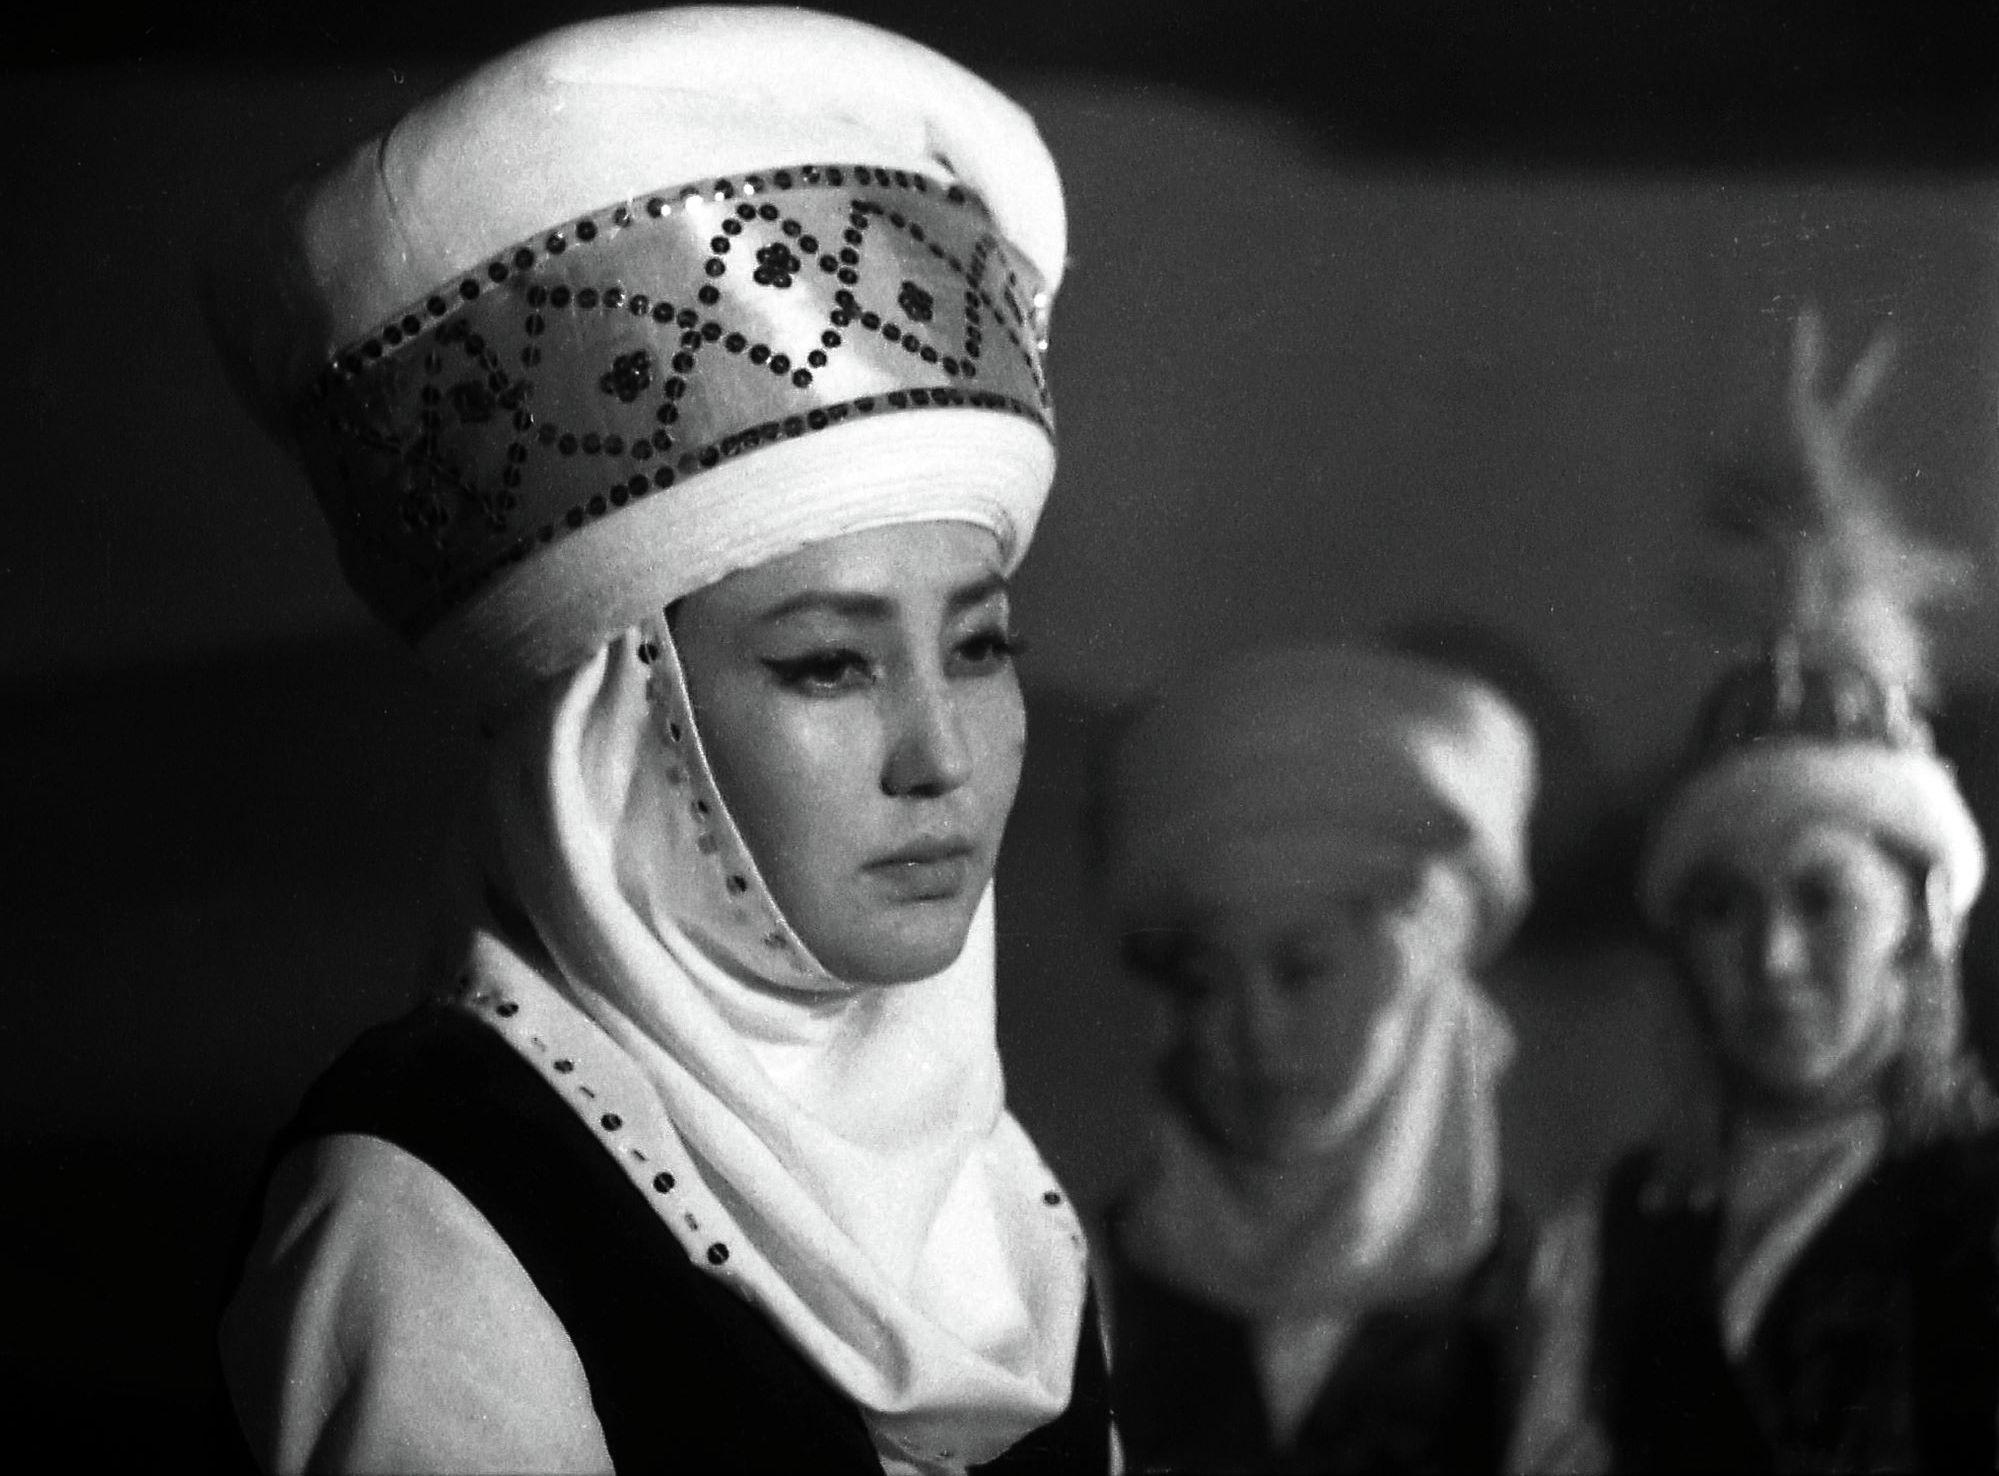 Актриса театра и кино, заслуженная артистка Киргизской ССР Таттыбубу Турсунбаева в роли Ак-Моор